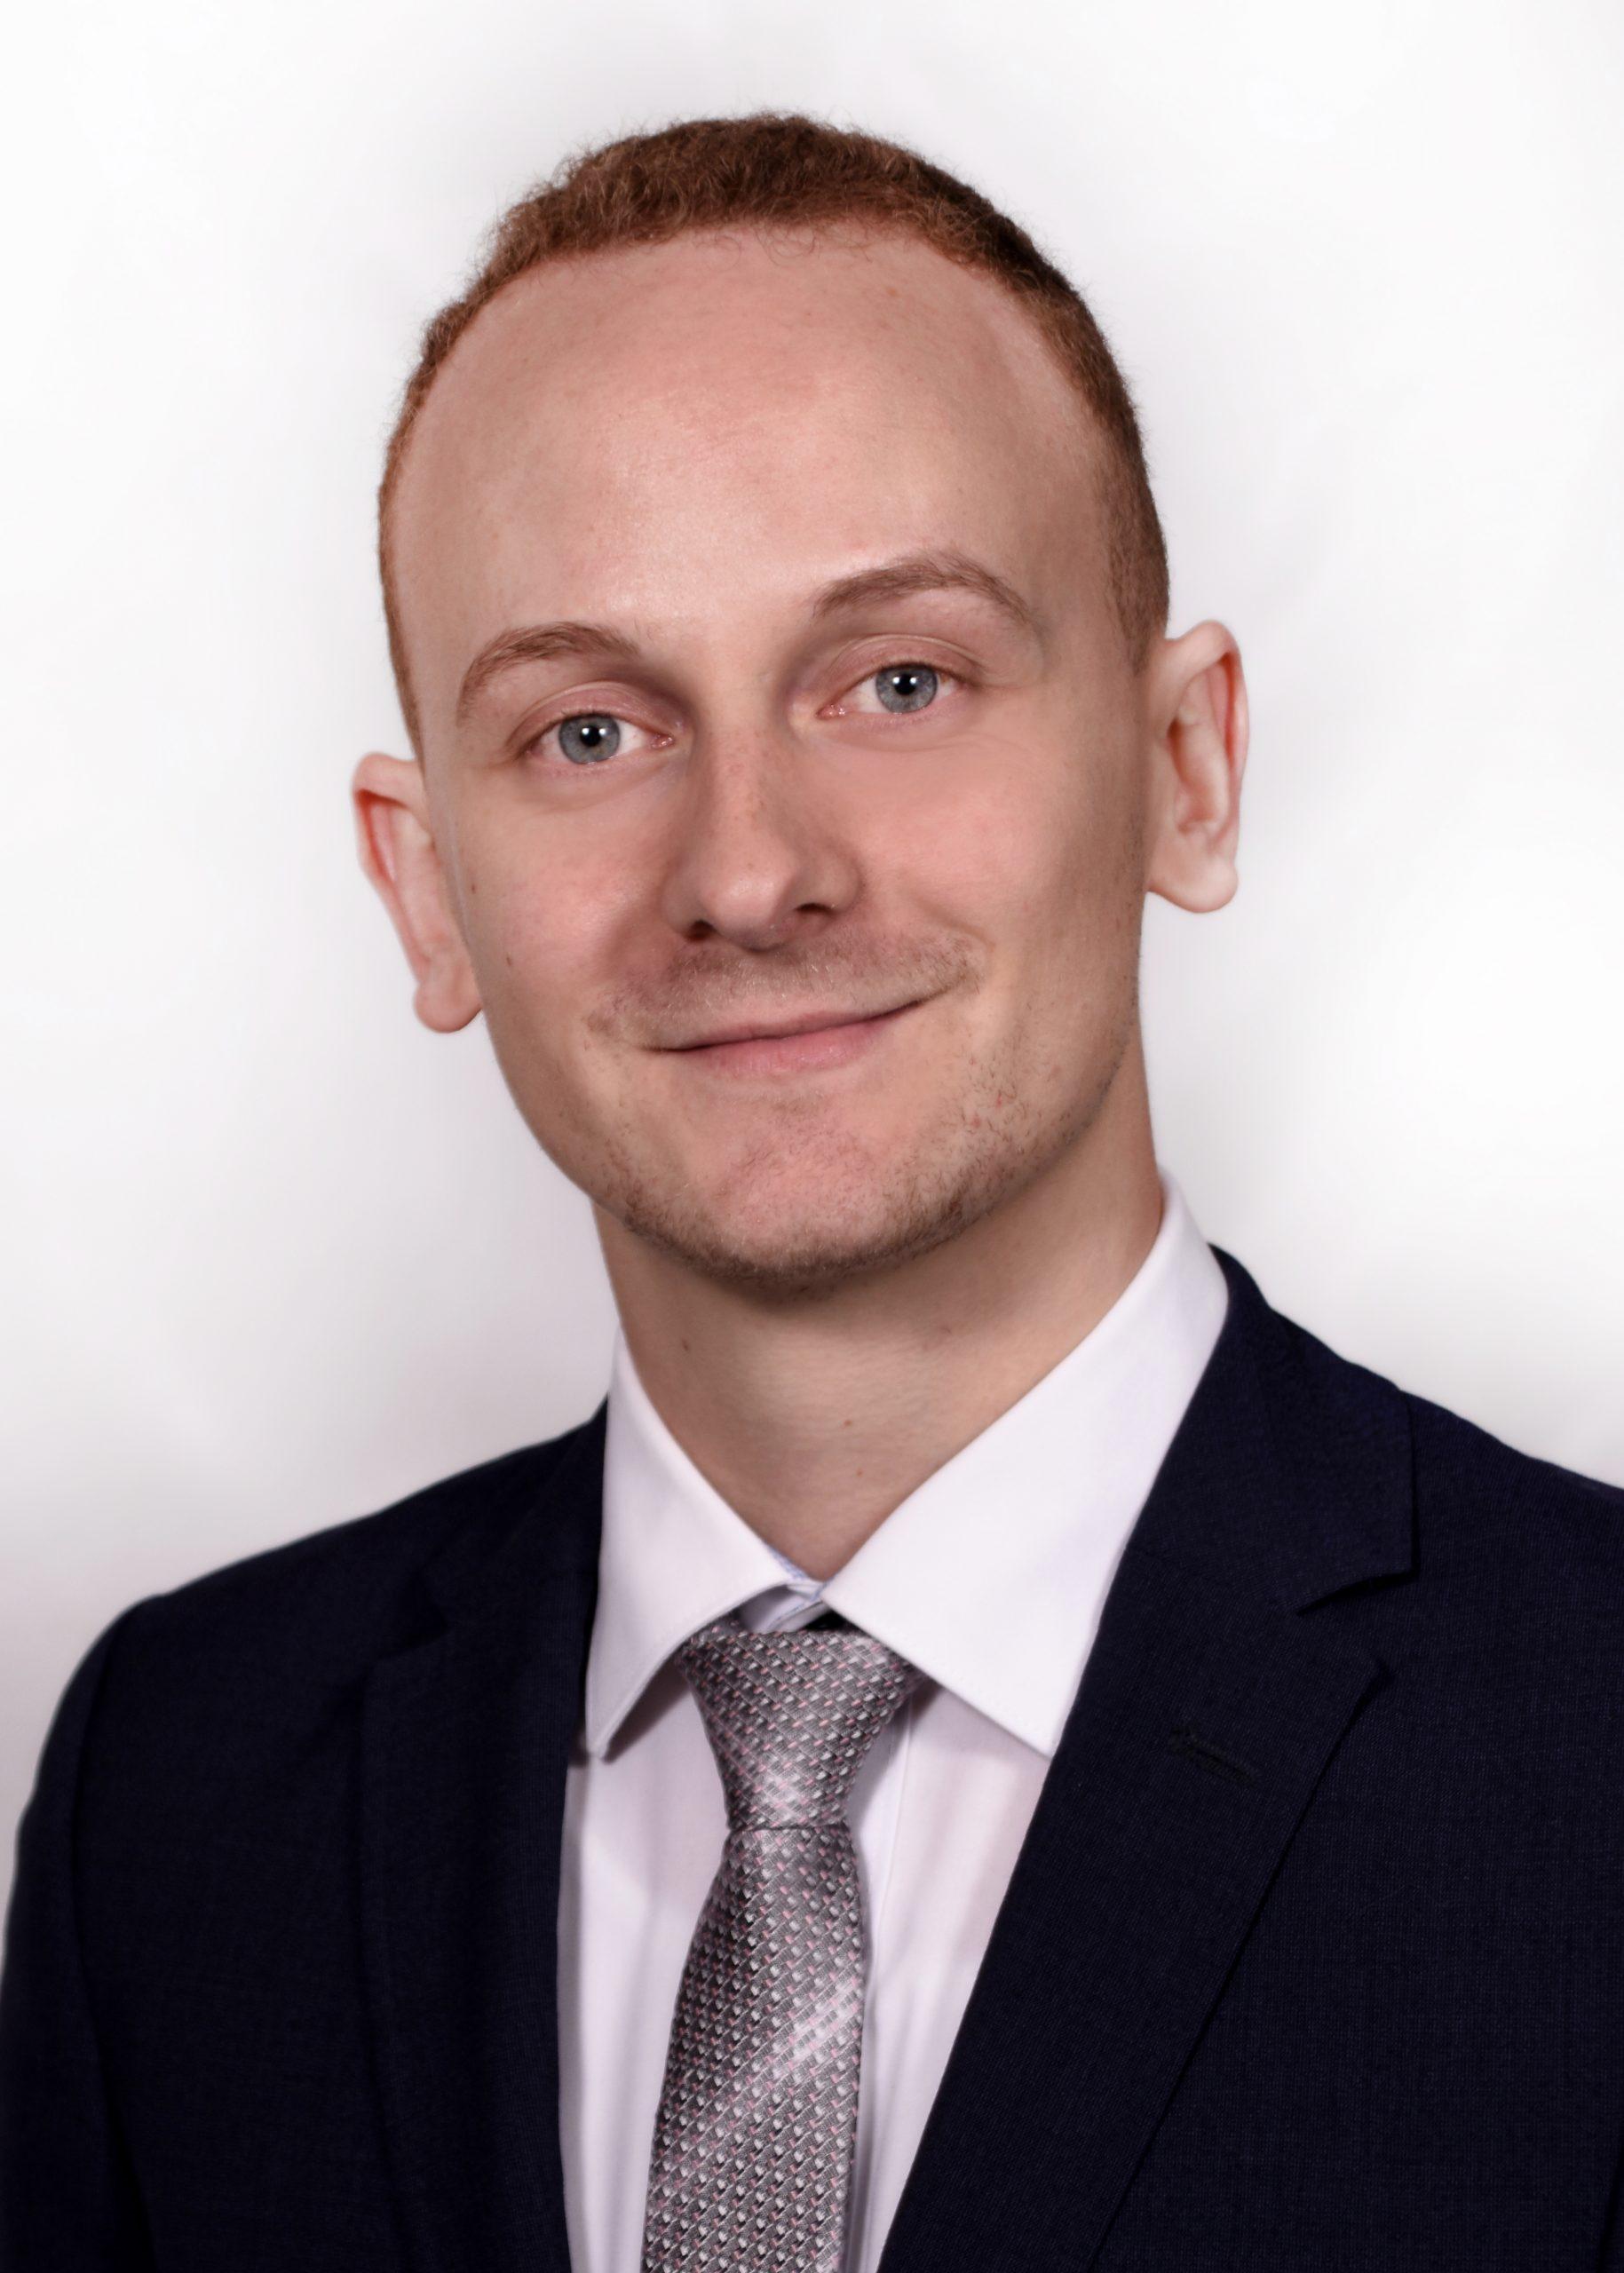 Nils-Torben Dürrast